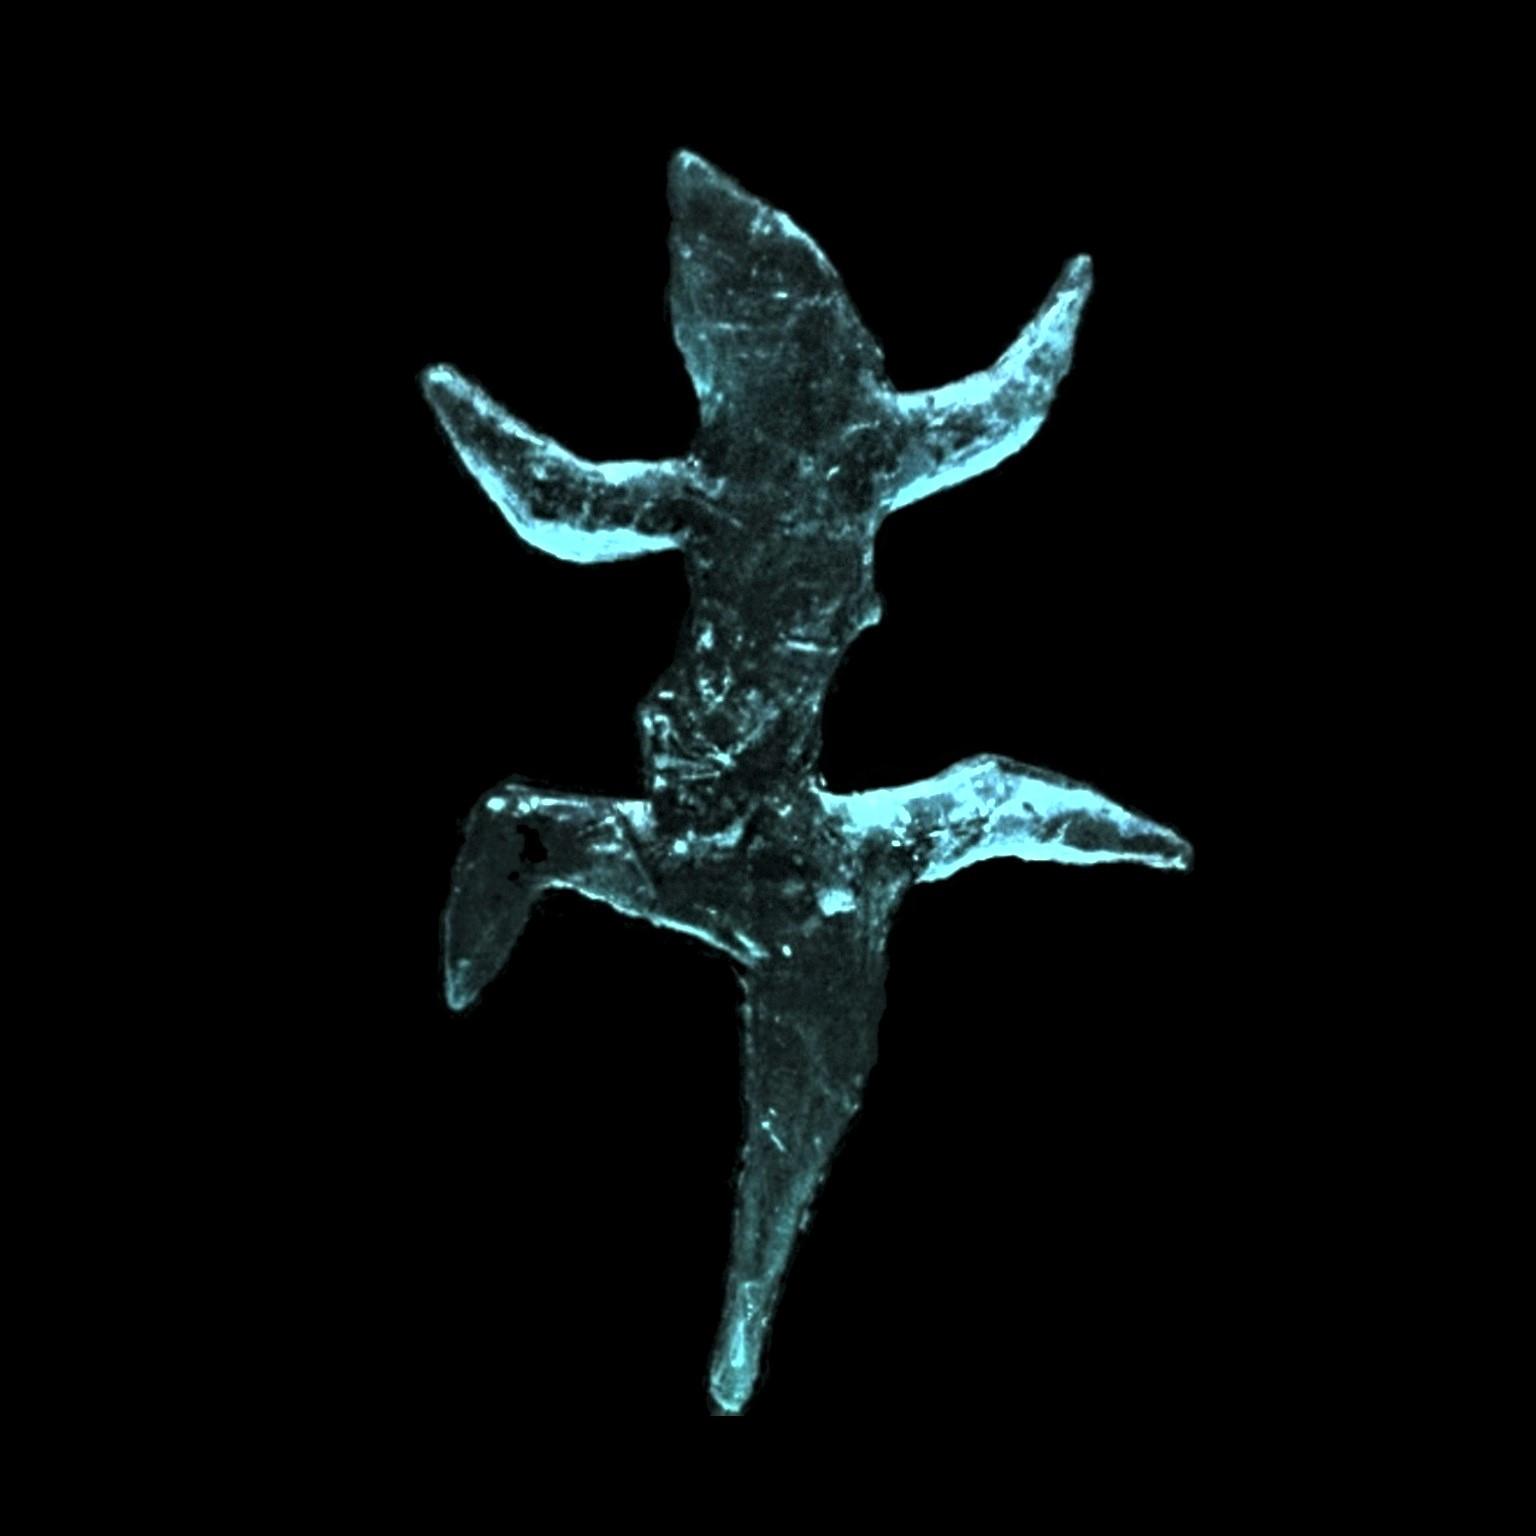 Vieux-Jeux by MOrlOck